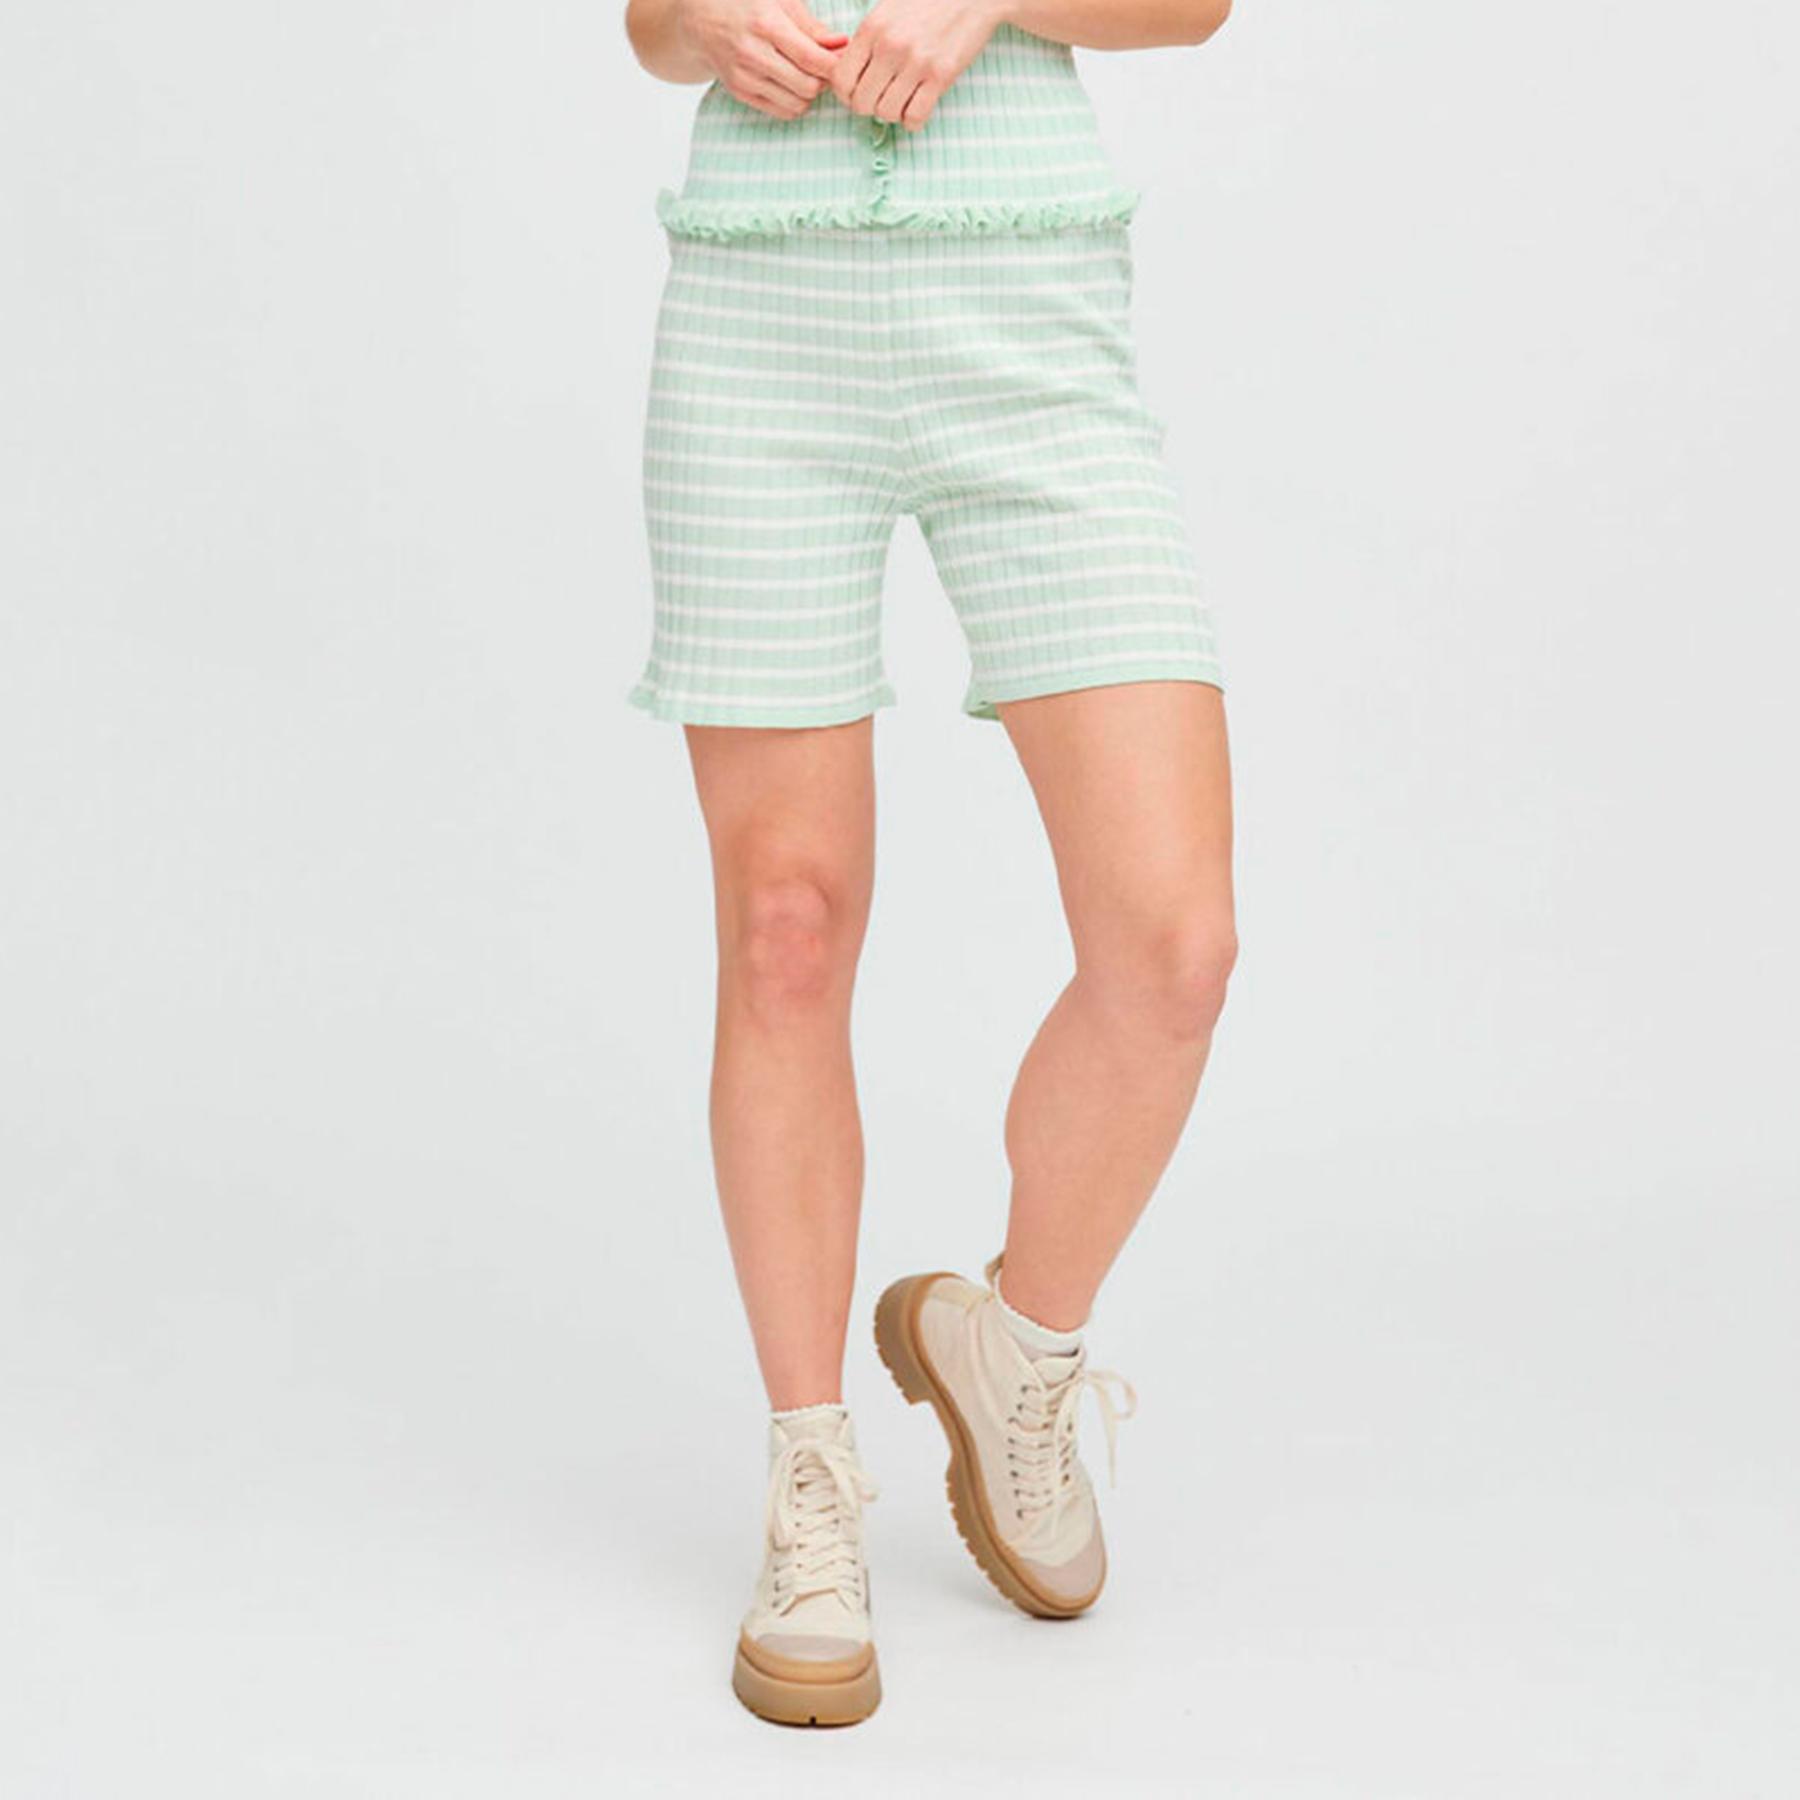 Køb A-view – Sira shorts – Shorts til damer – 111 PALE MINT/OFF WH – 34